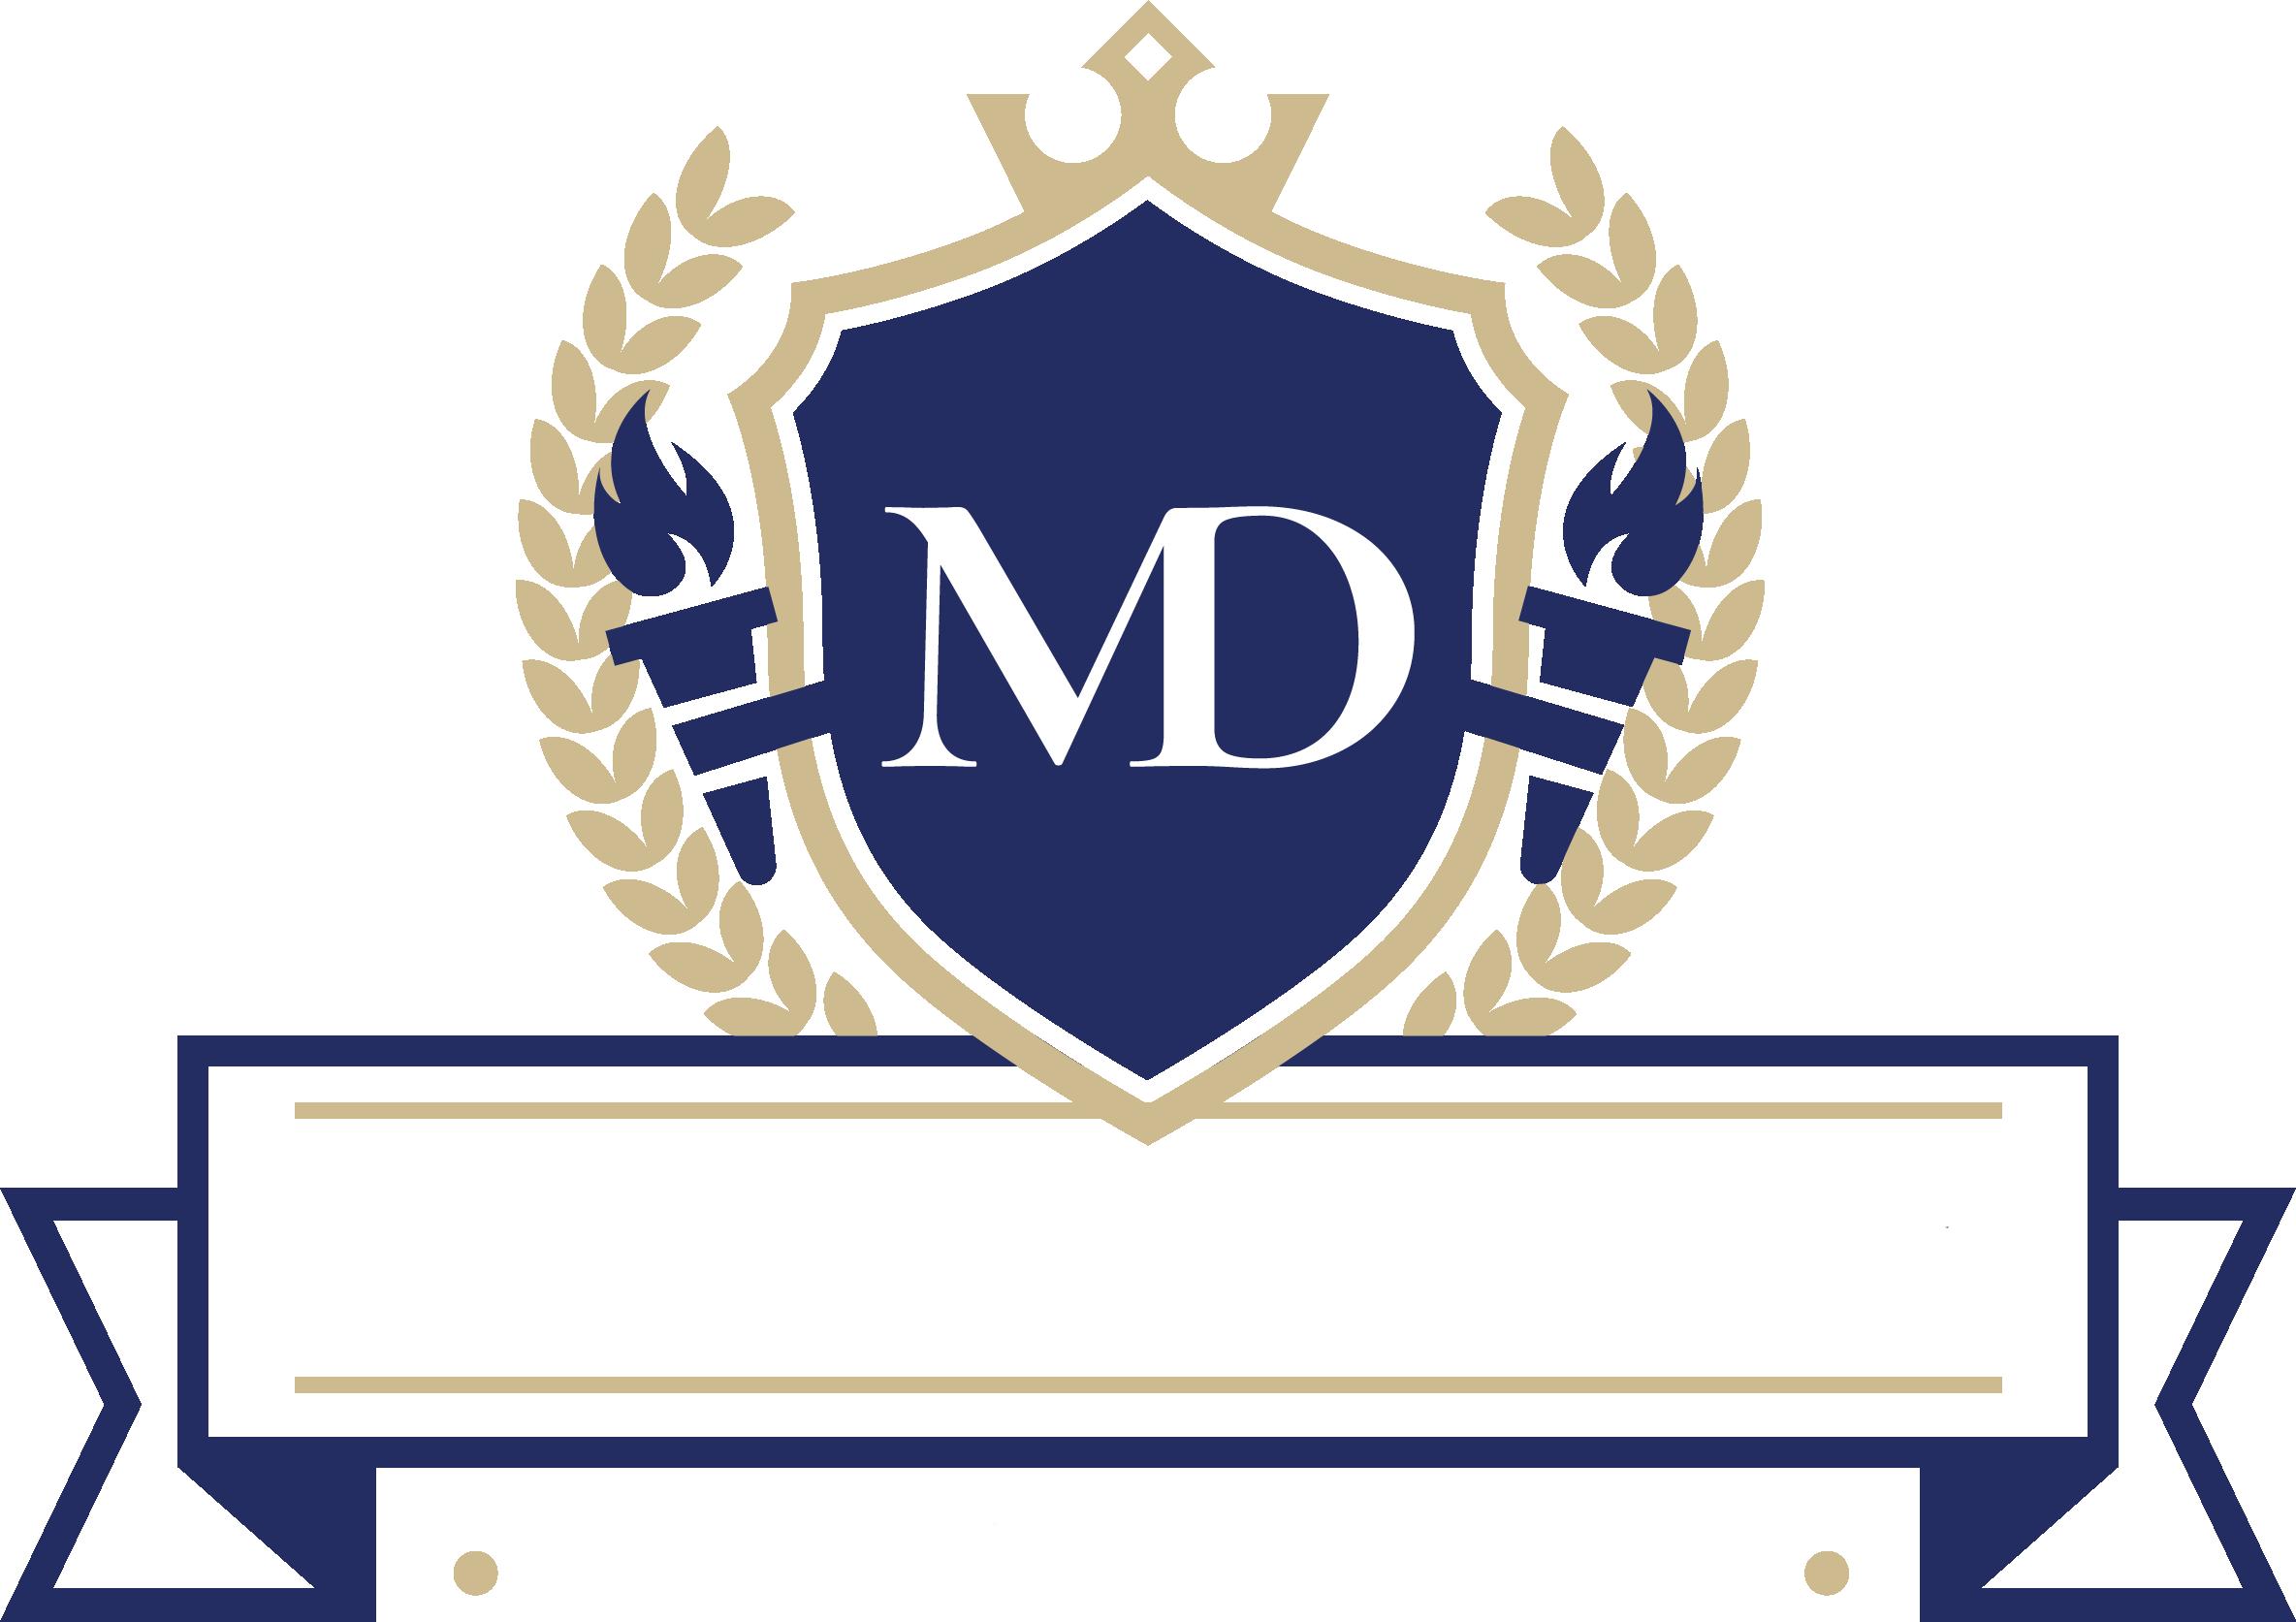 Mark Diaz